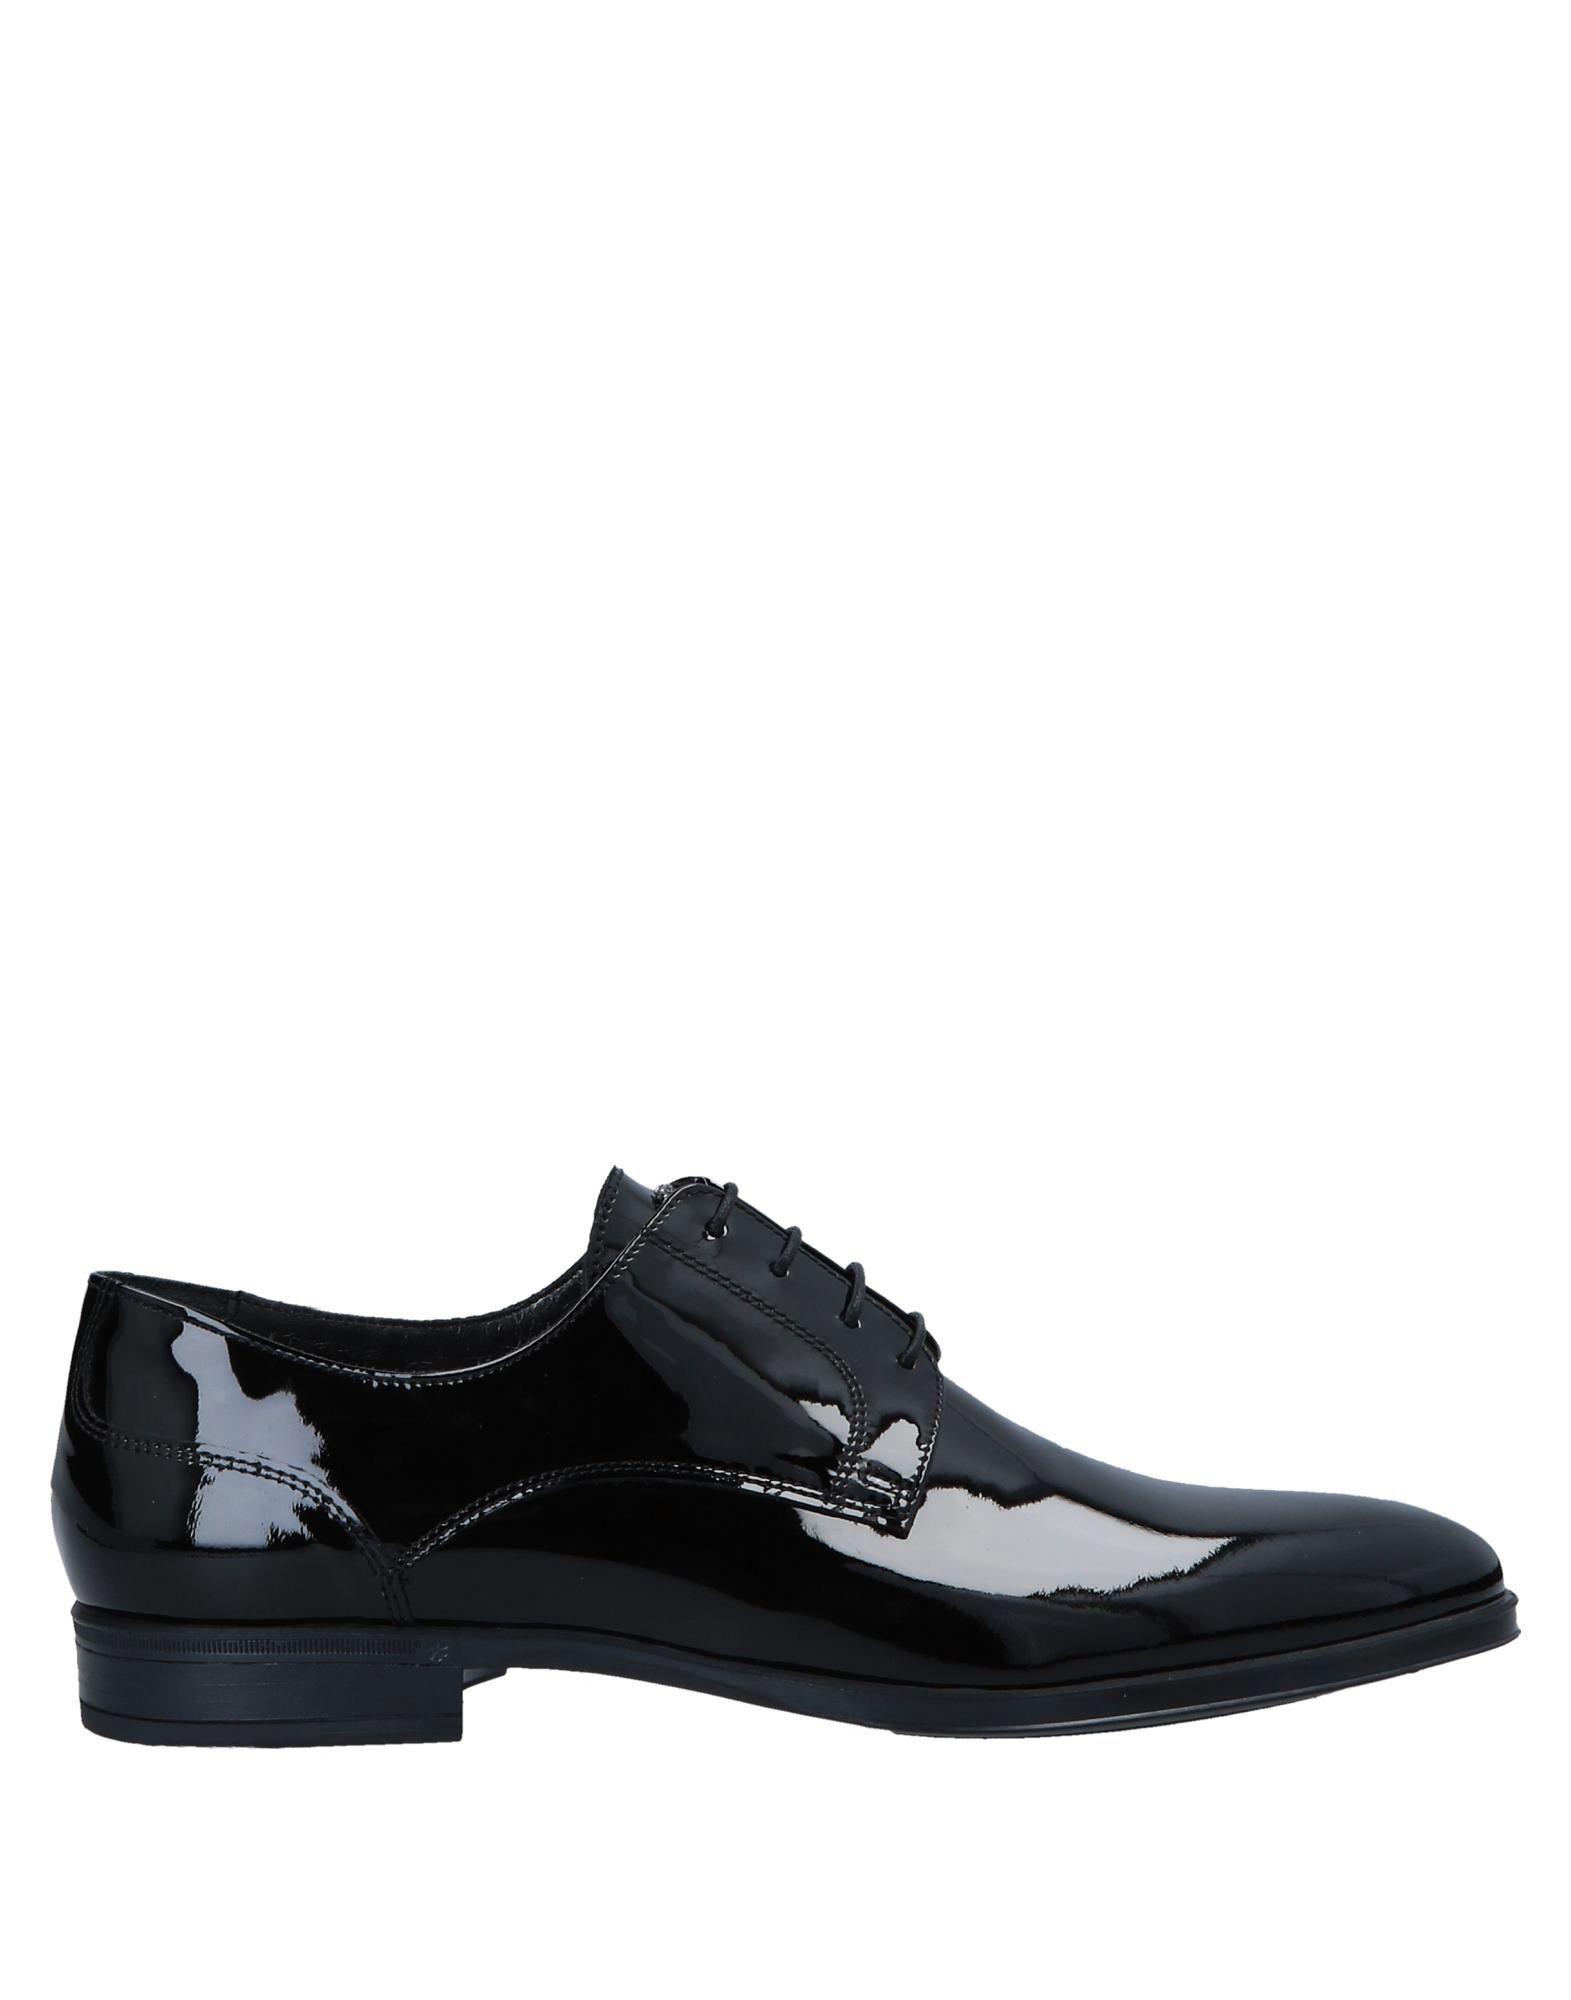 Rabatt echte Schuhe Principe  Di Milano Schnürschuhe Herren  Principe 11549883JU 49e951